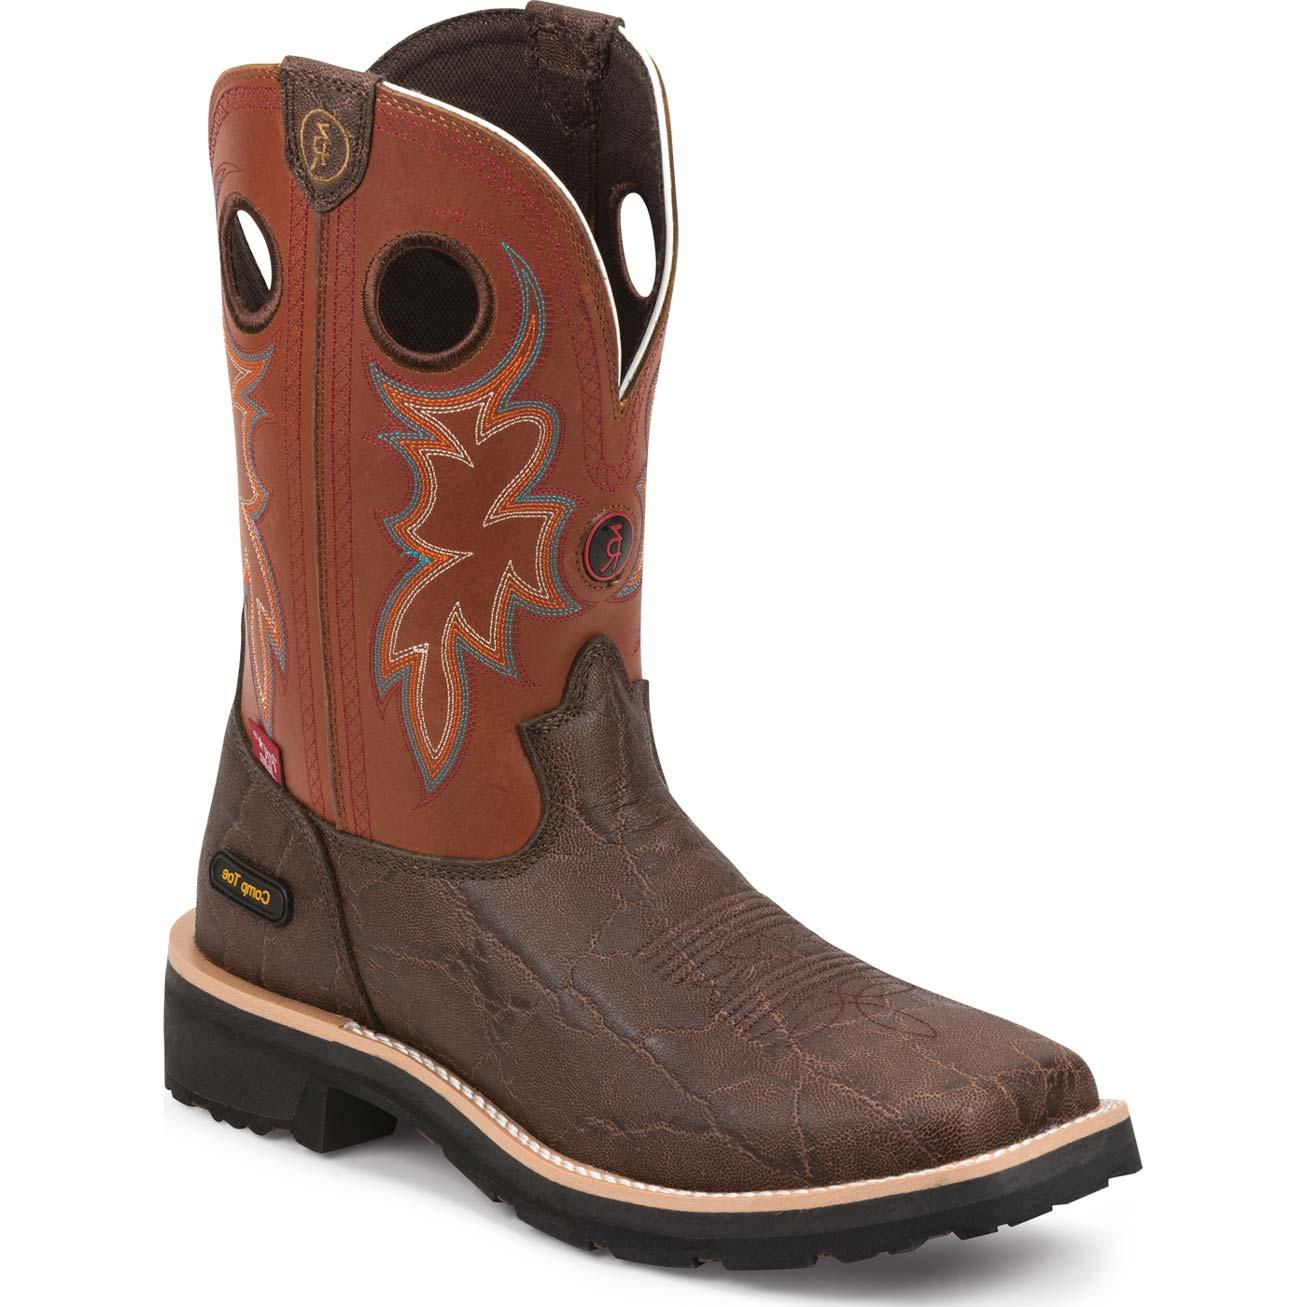 6d6fd4a285e Tony Lama 3R Composite Toe Western Work Boot